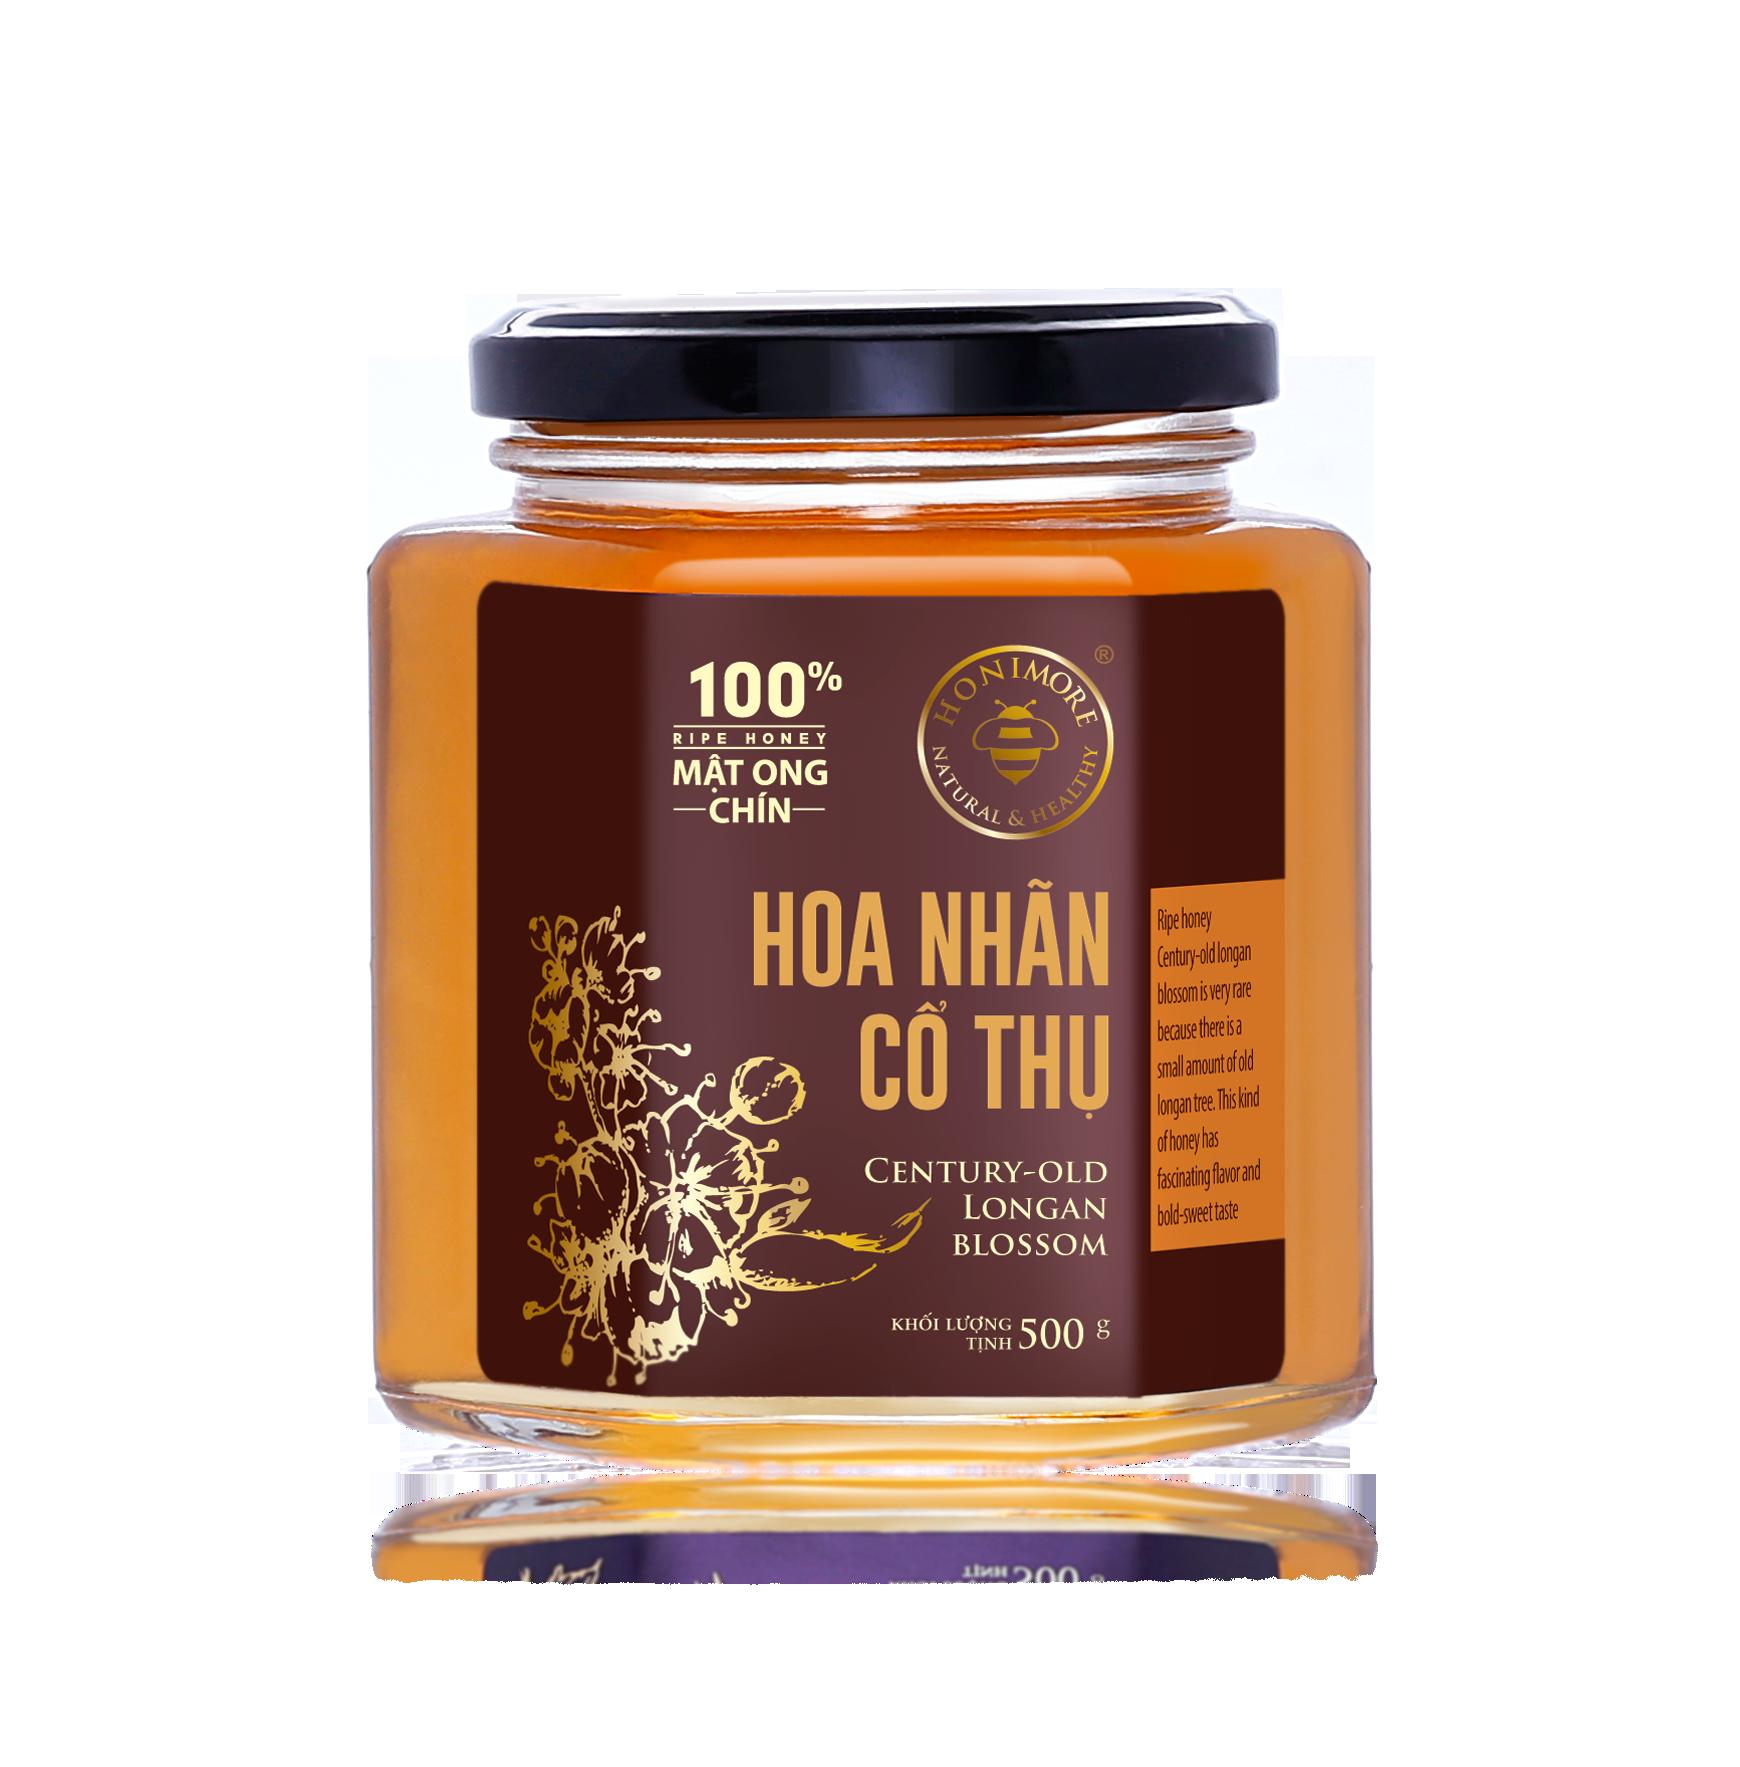 Honimore Ripe Honey - Century Old Longan Blossom 500g